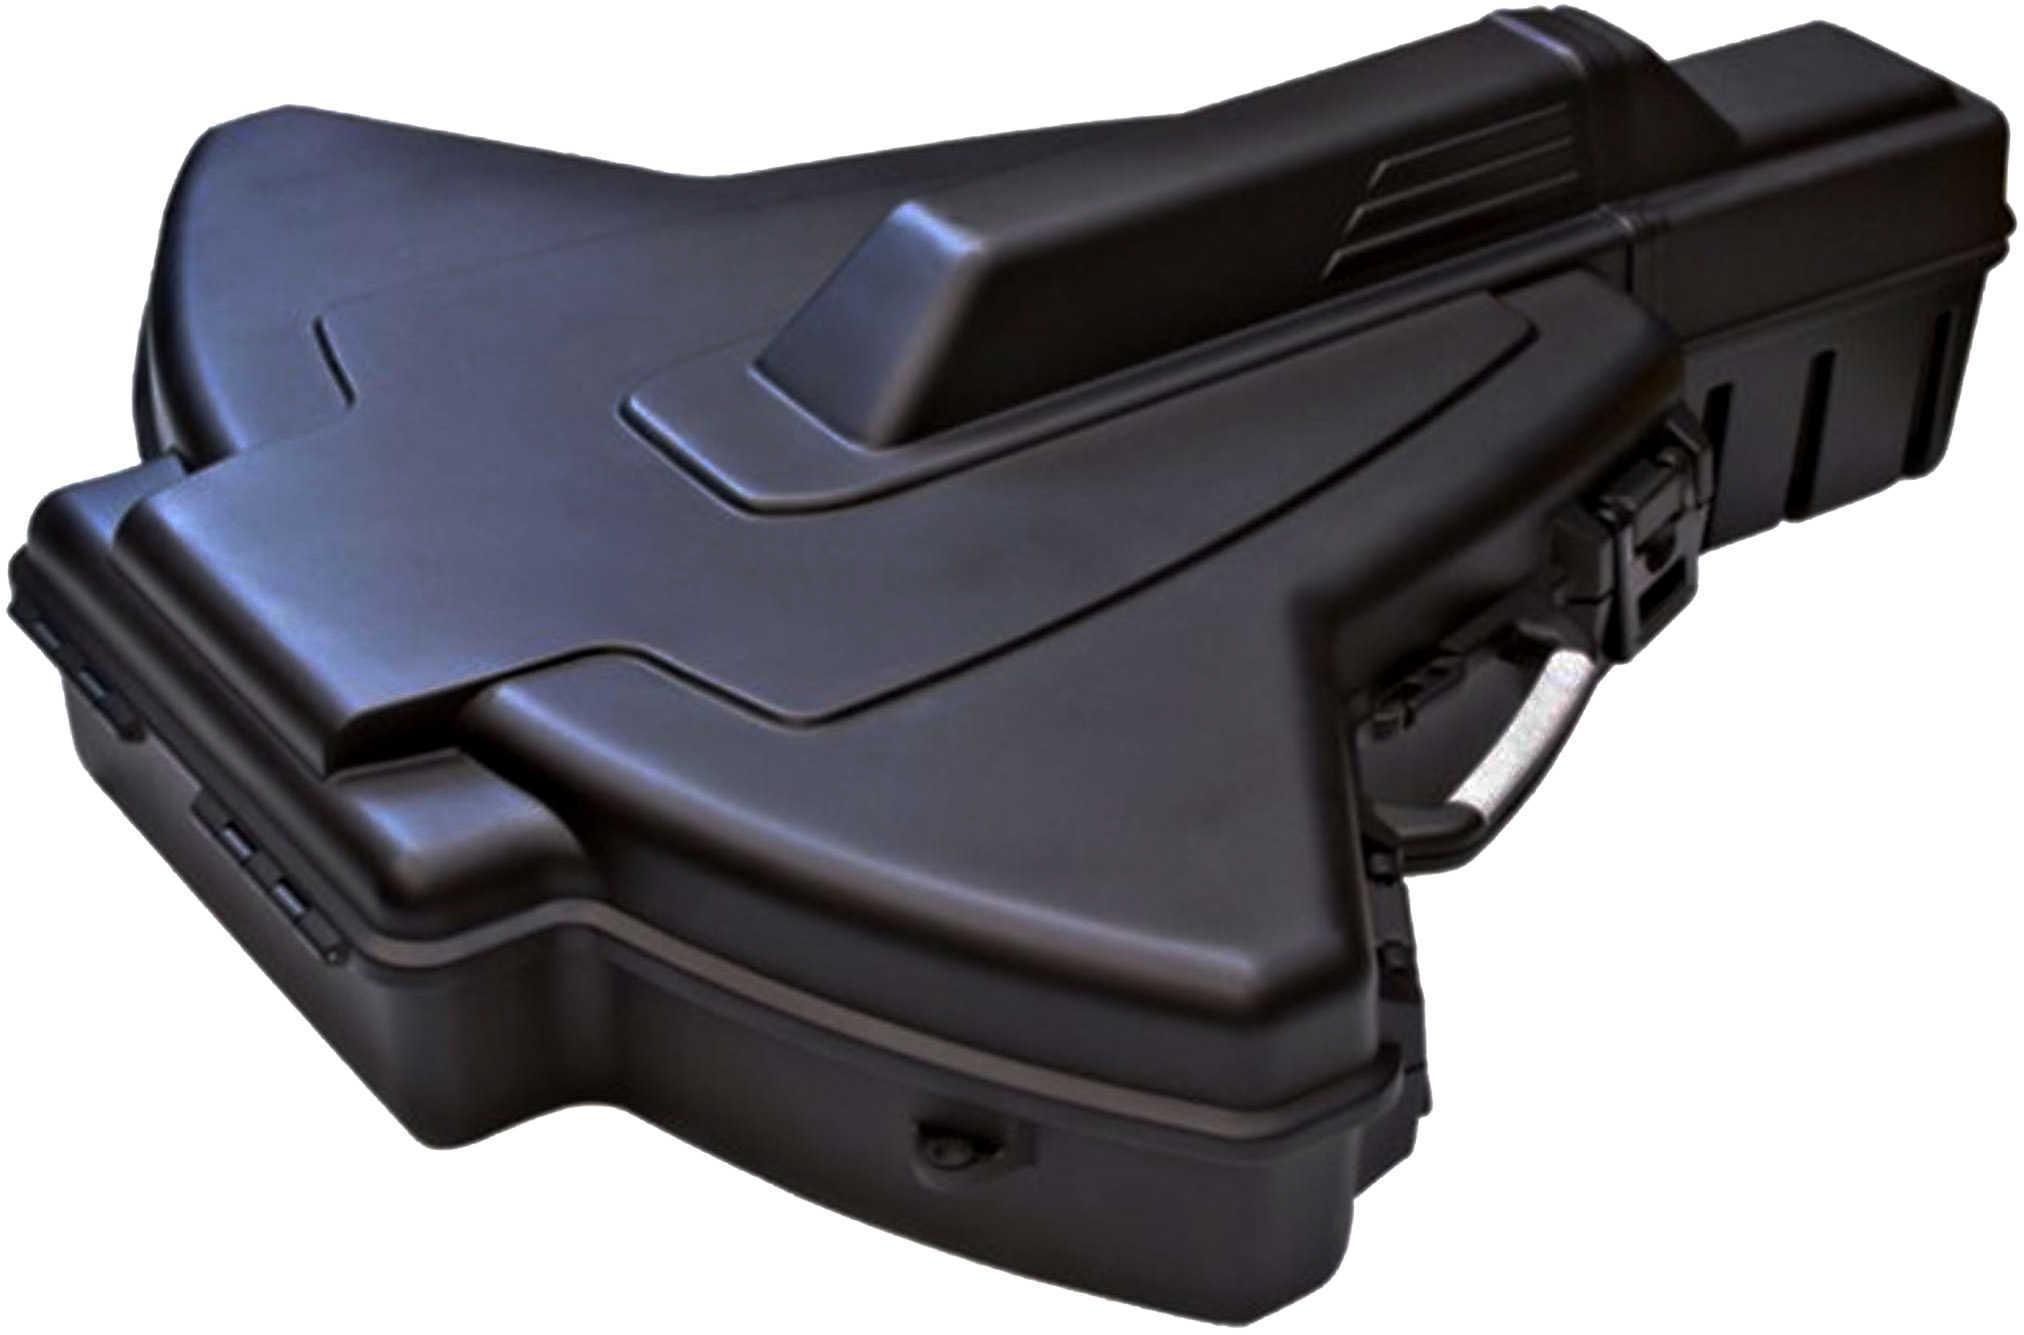 Plano Manta Crossbow Case Black Model: 1133-00